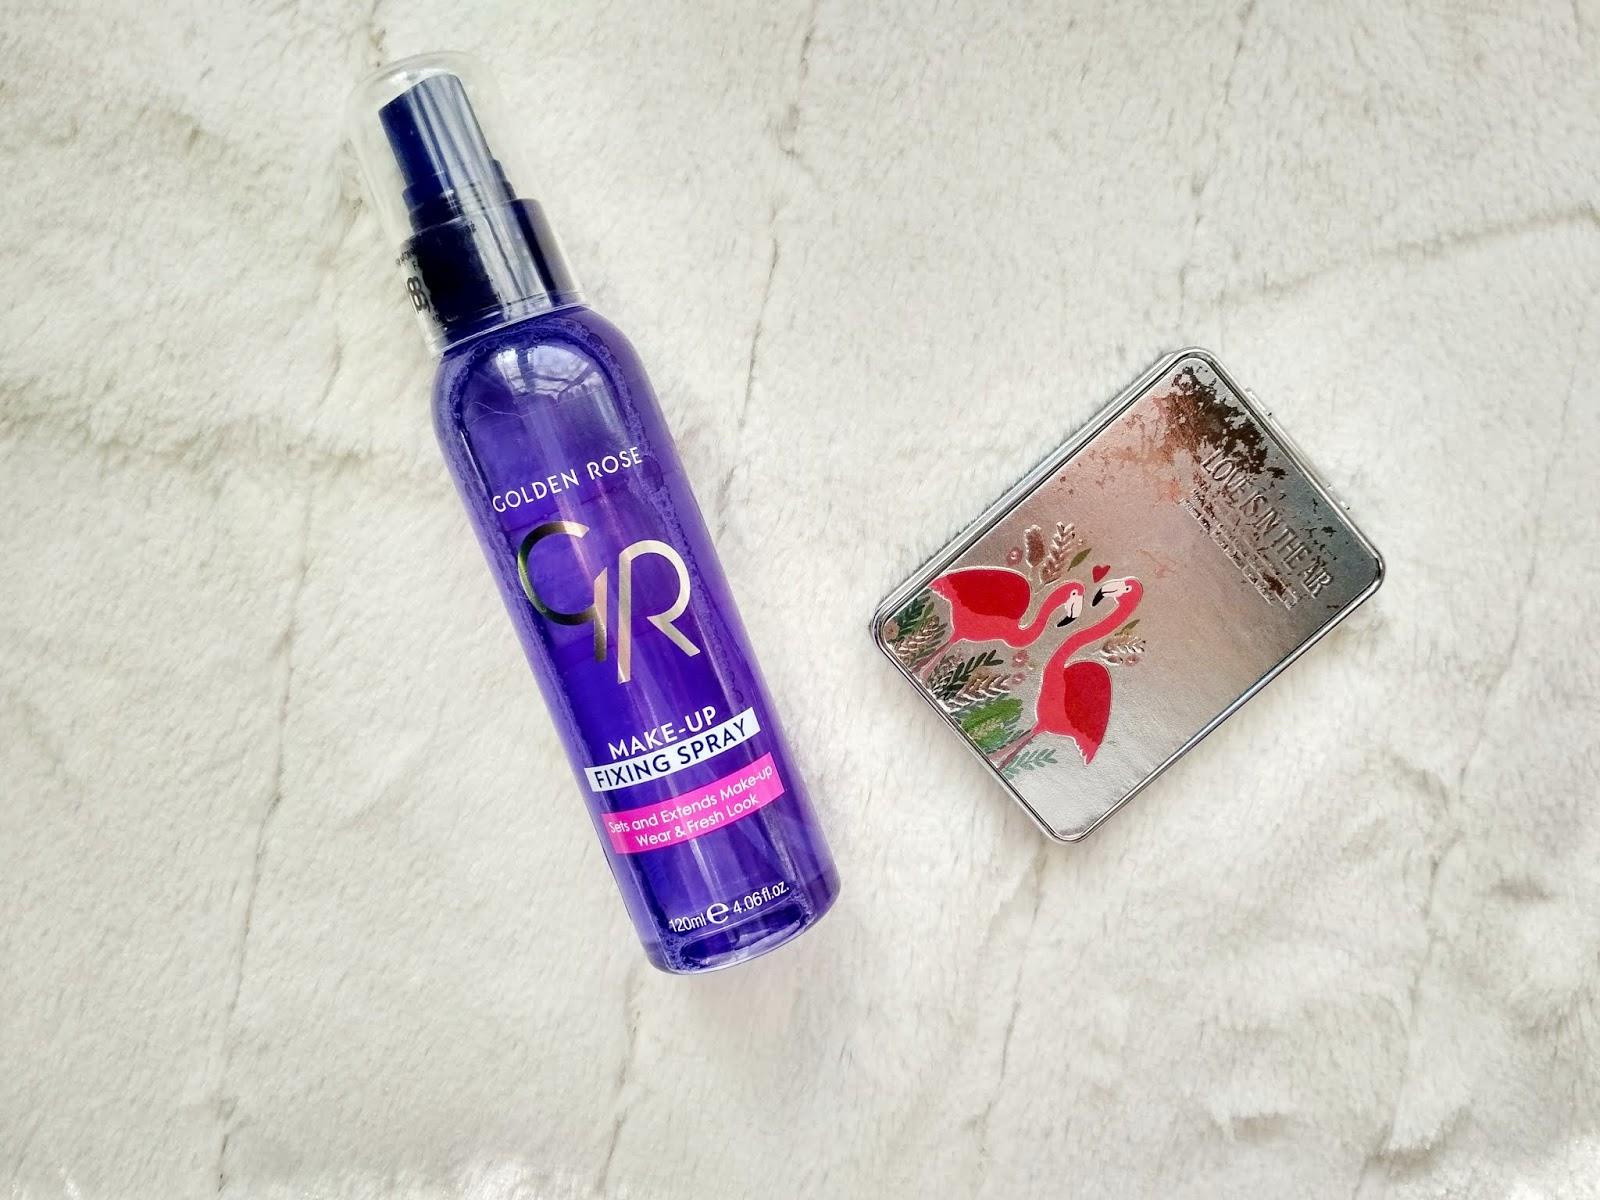 Recenzja - Golden Rose fixer do makijażu